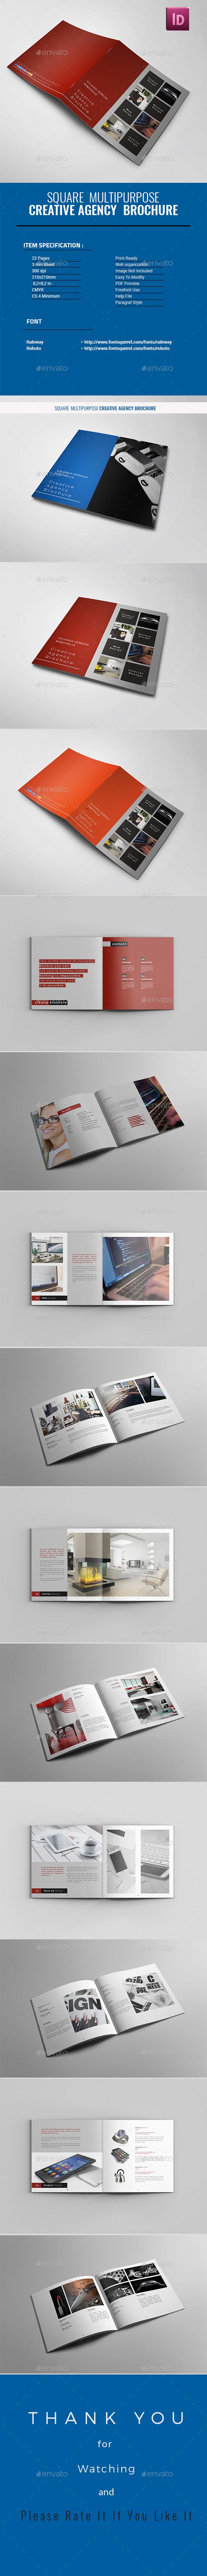 Creative Agency Brochure - Brochures Print Templates